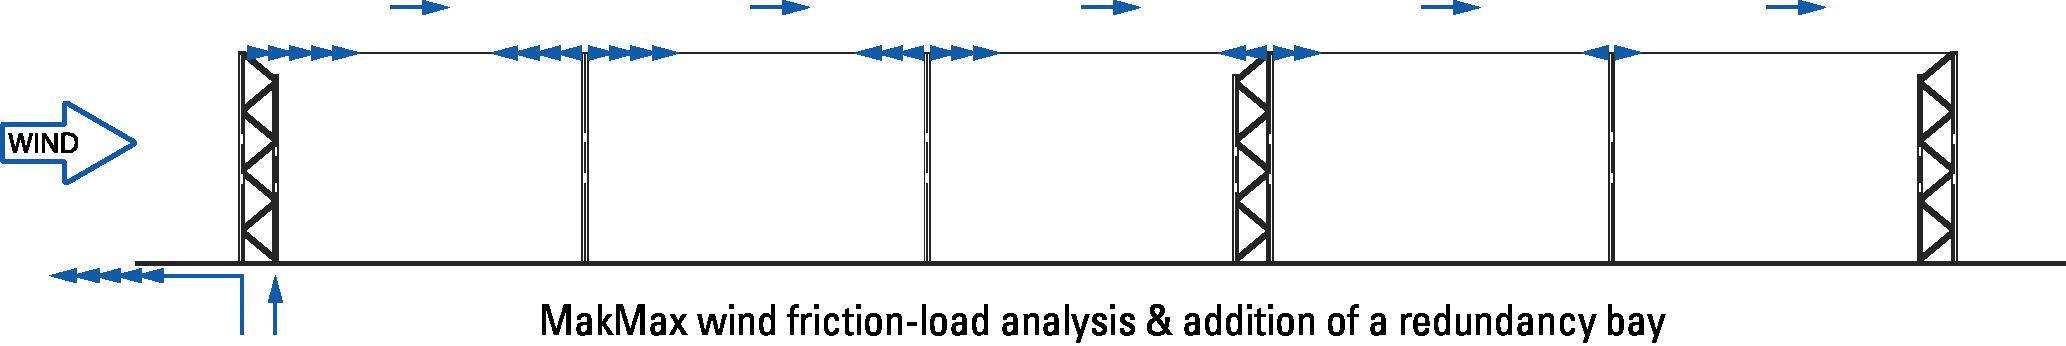 MakMax Wind Analysis - additional redundancy bay